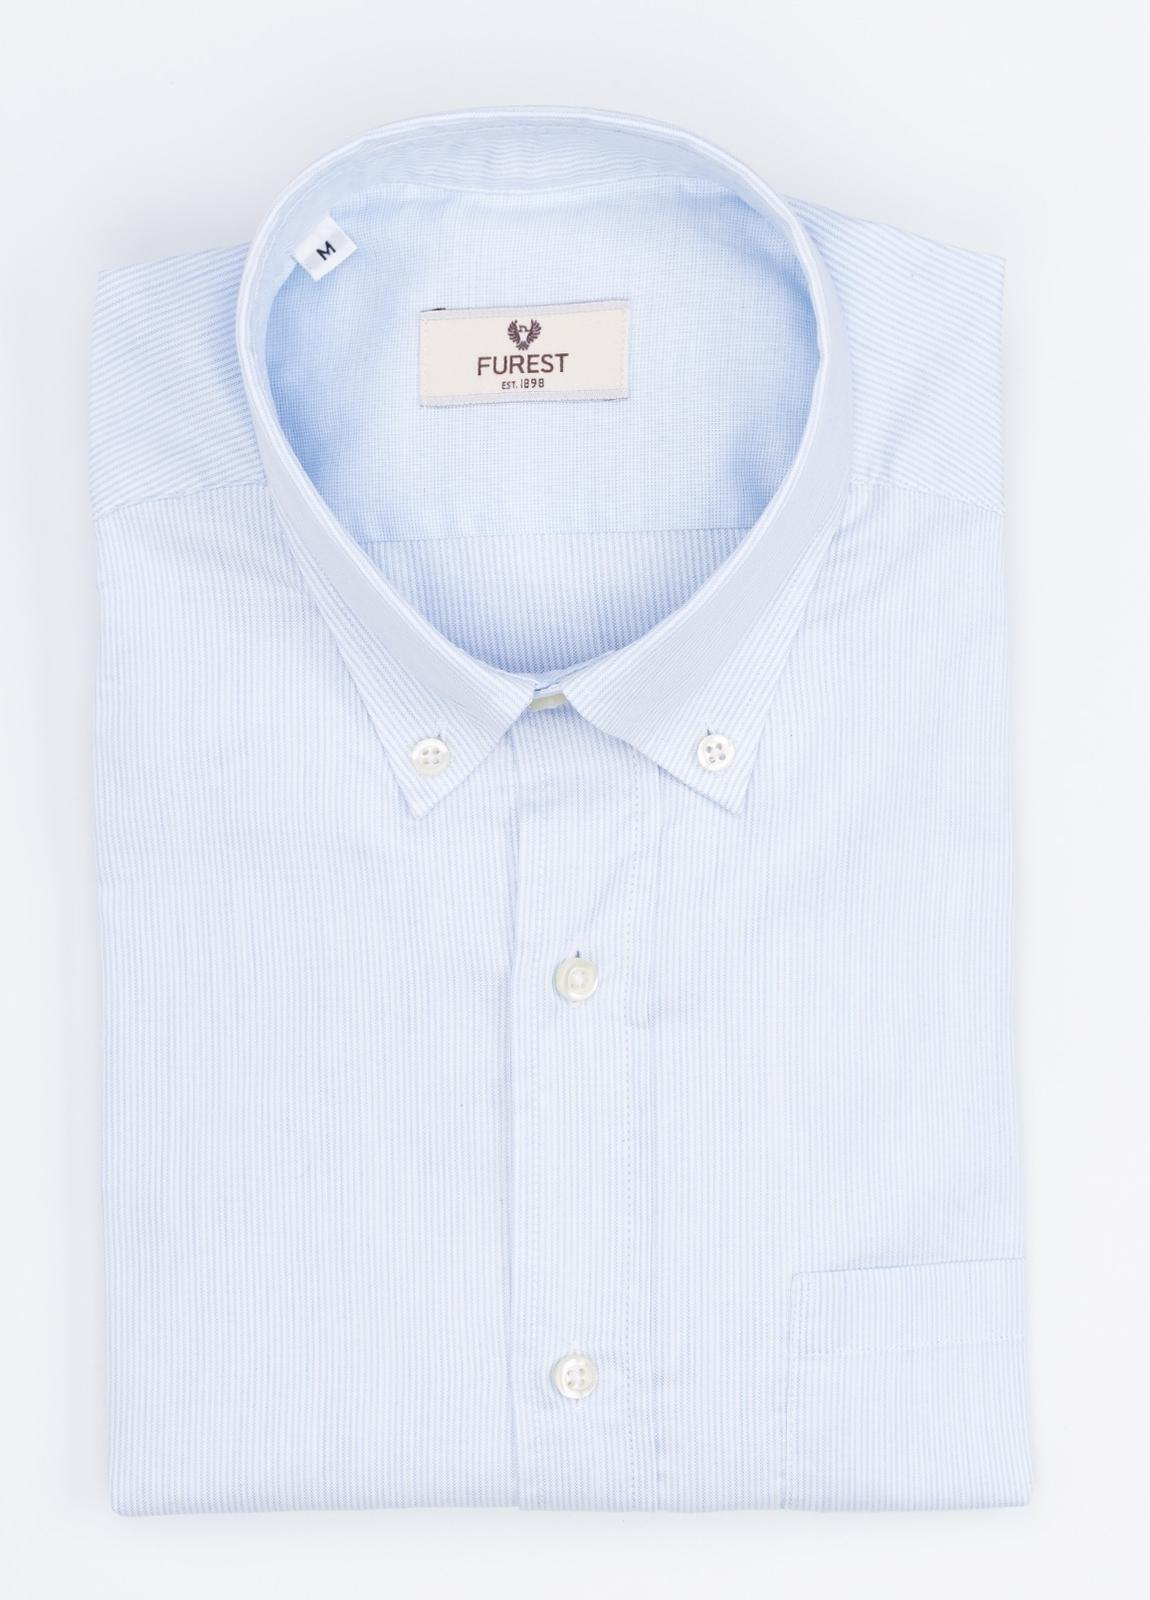 Camisa Leisure Wear REGULAR FIT Modelo BOTTON DOWN color celeste. 100% Algodón. - Ítem3